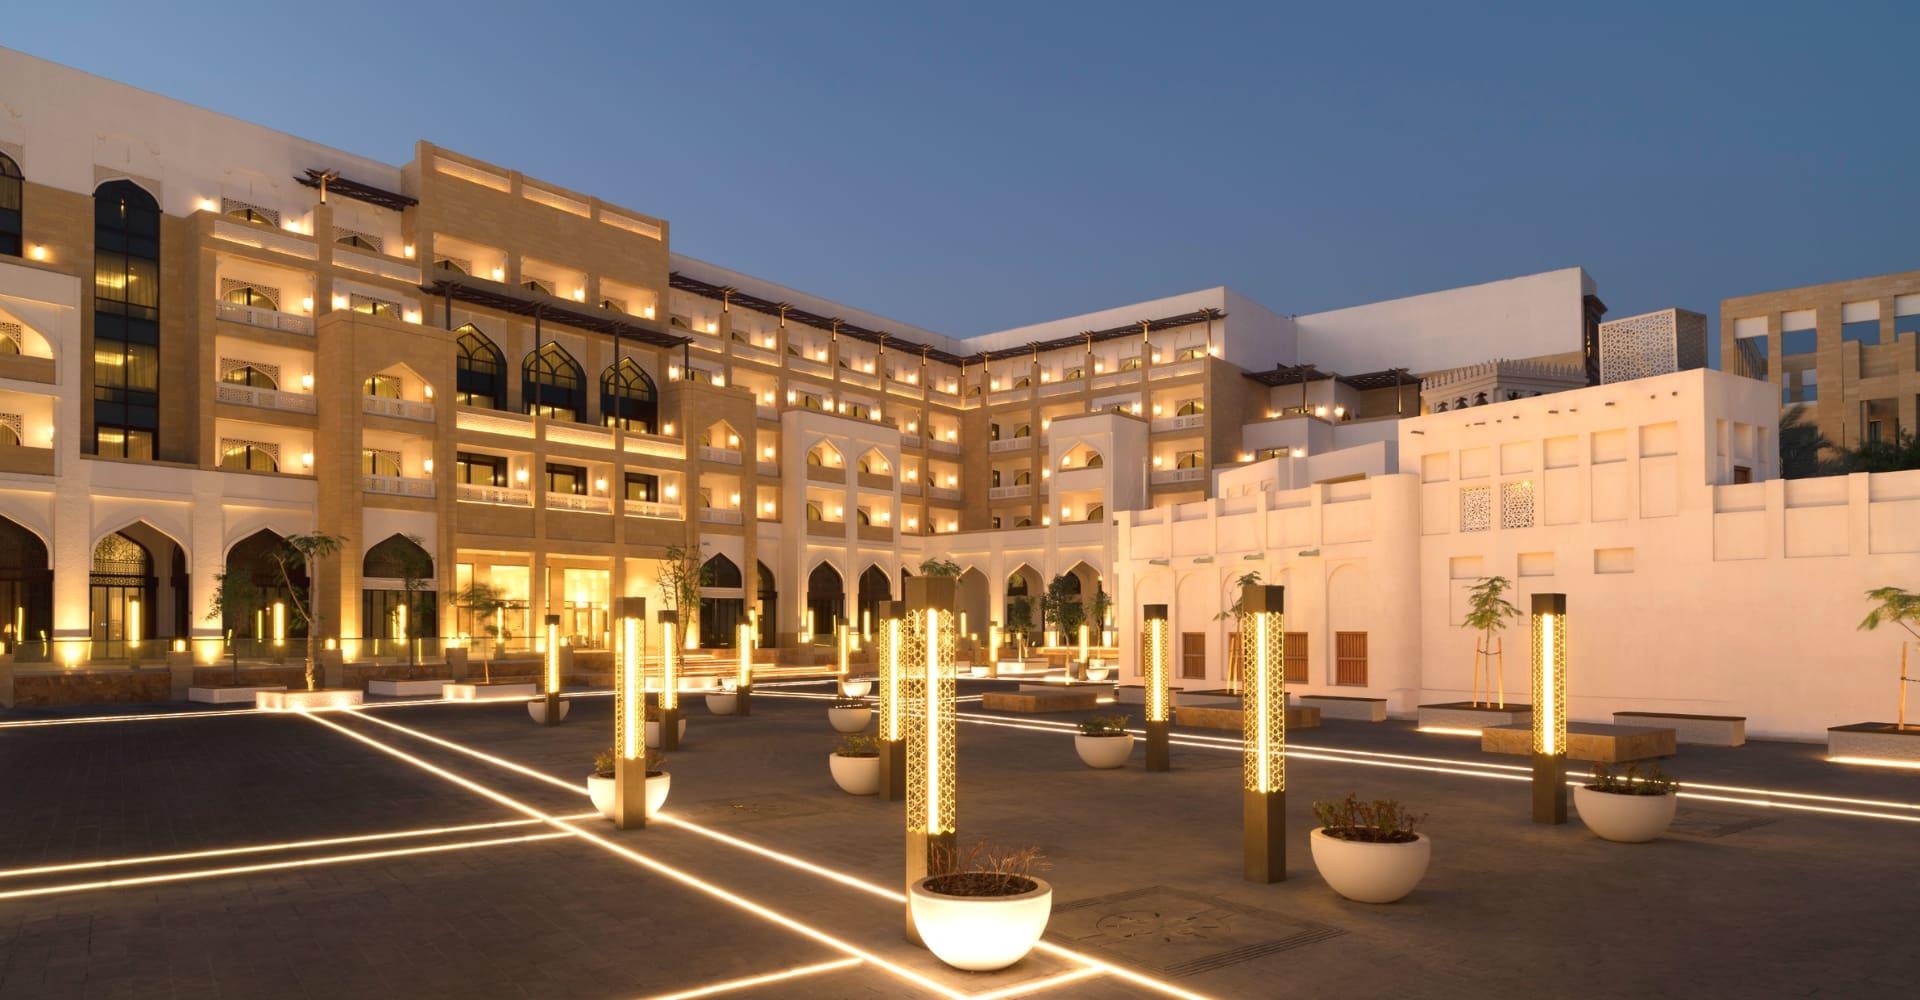 Hotels in Doha Qatar | Al Najada Hotel by Tivoli Official Site